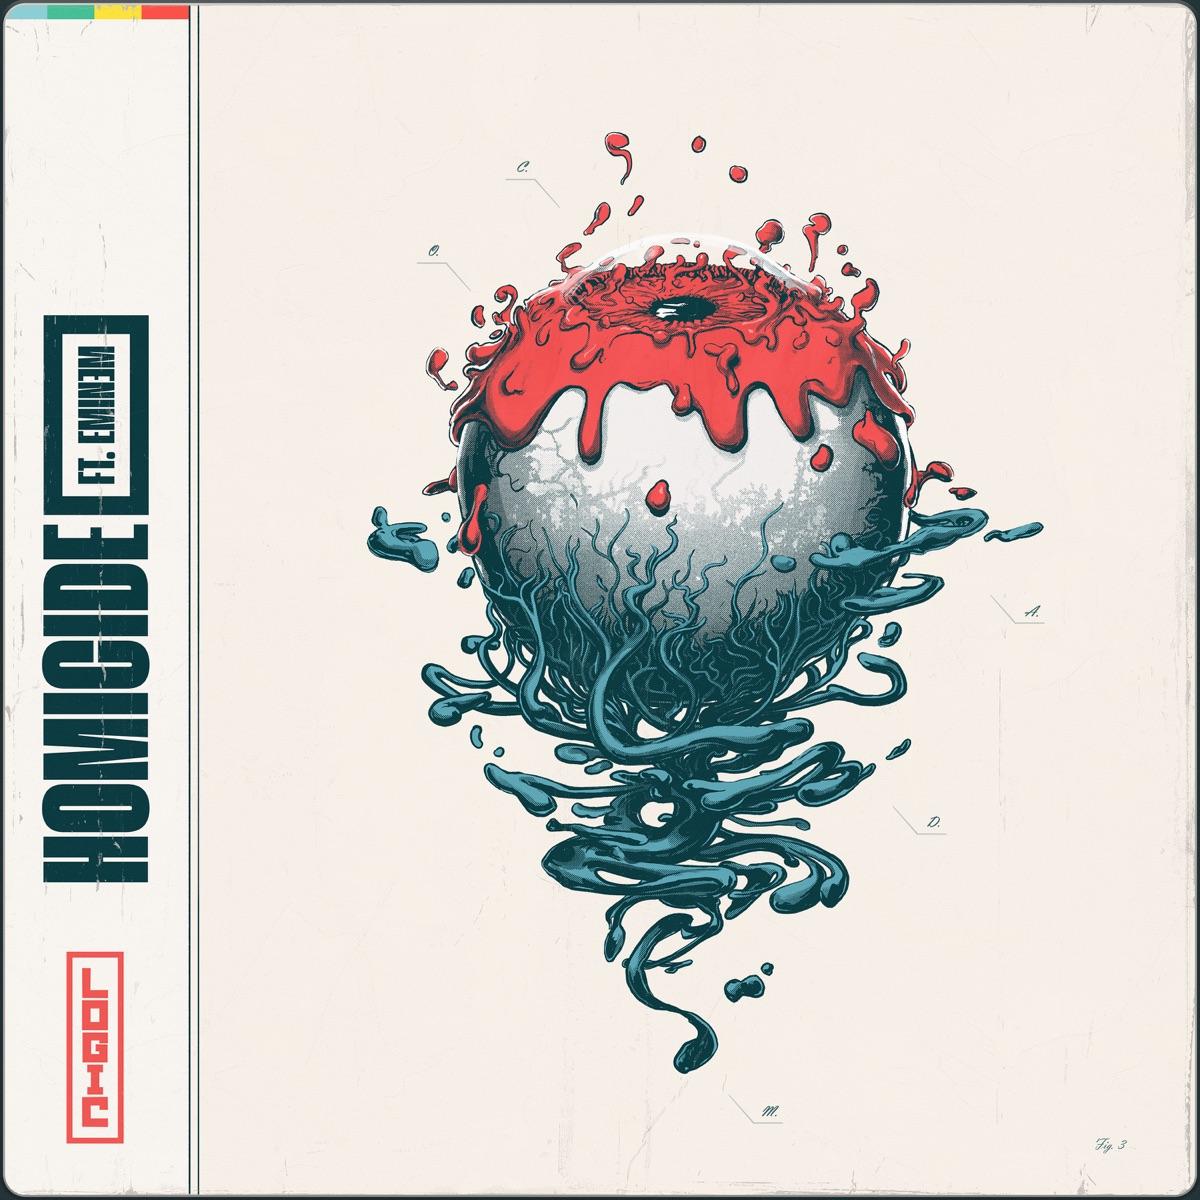 Confessions Of A Dangerous Mind Logic Still BallinLogic Feat Wiz Khalifa poster